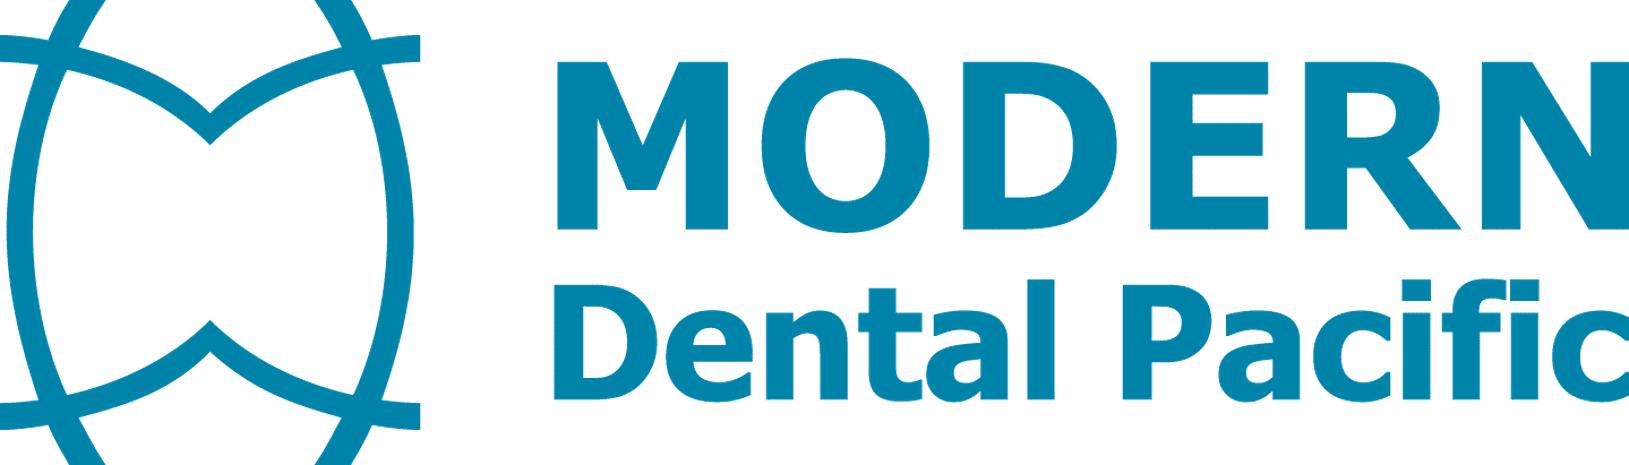 11 Modern Dental